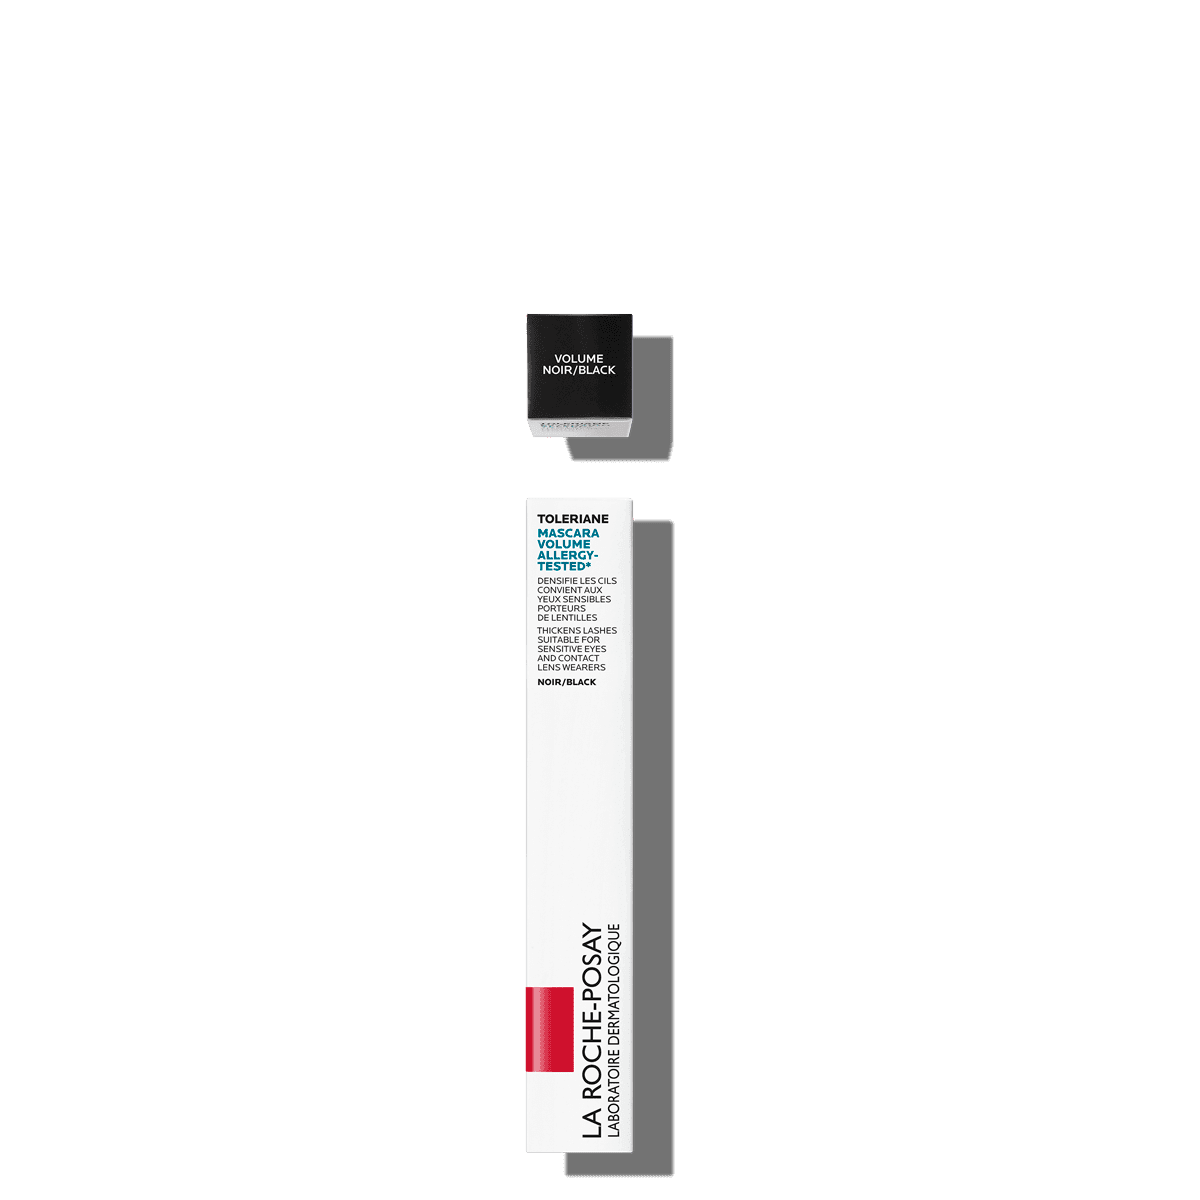 La Roche Posay Sensitiv Toleriane Makeup VOLUMEN MASCARA Sort 333787